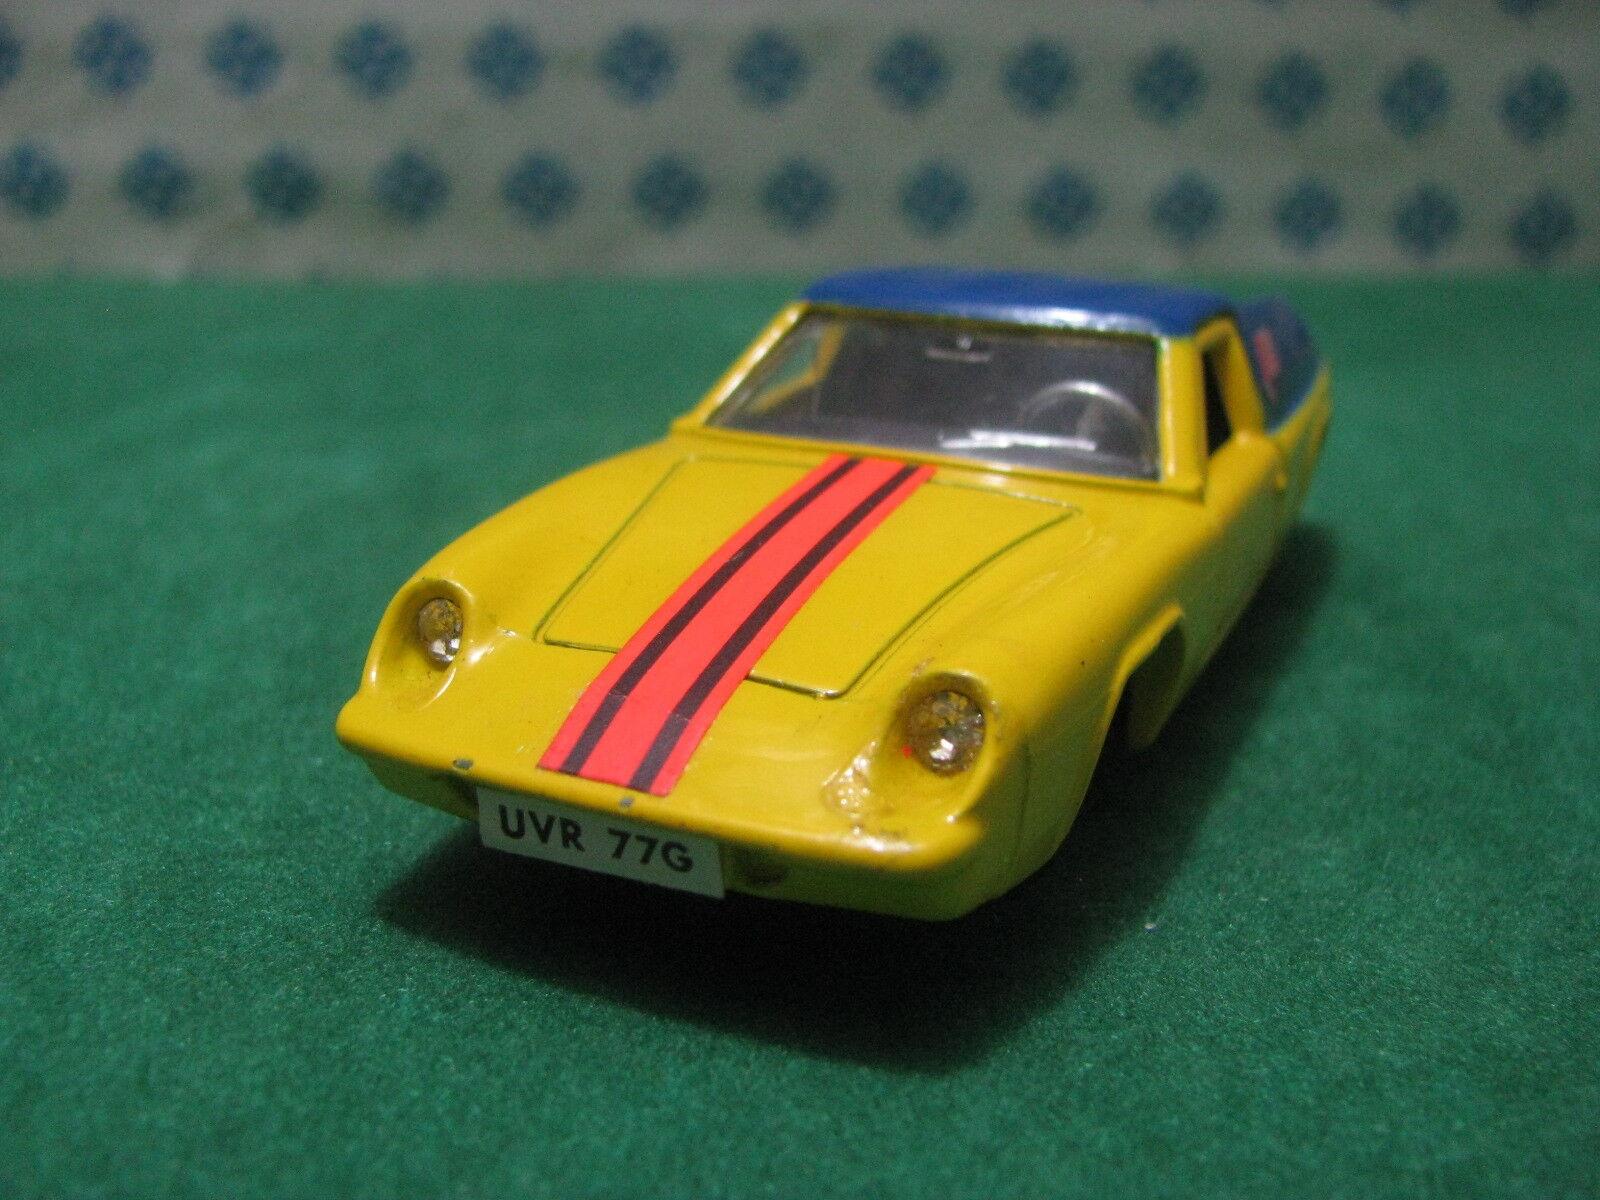 Vintage - Lotus Europa Compétition - 1 43 Dinky Toys 218